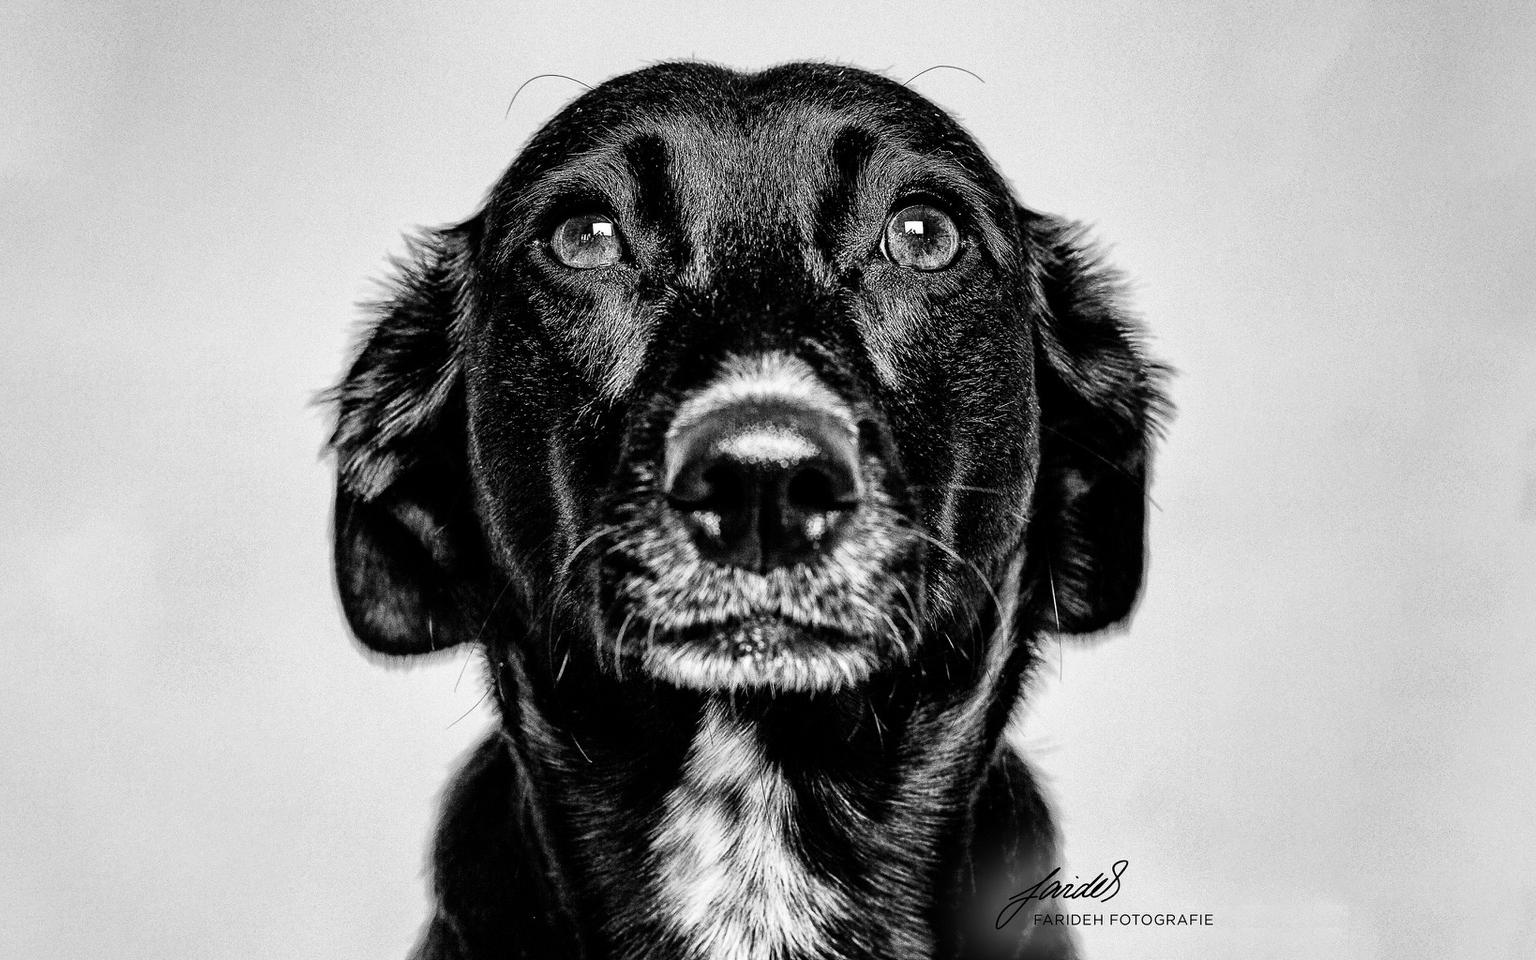 Agenturhund Frida